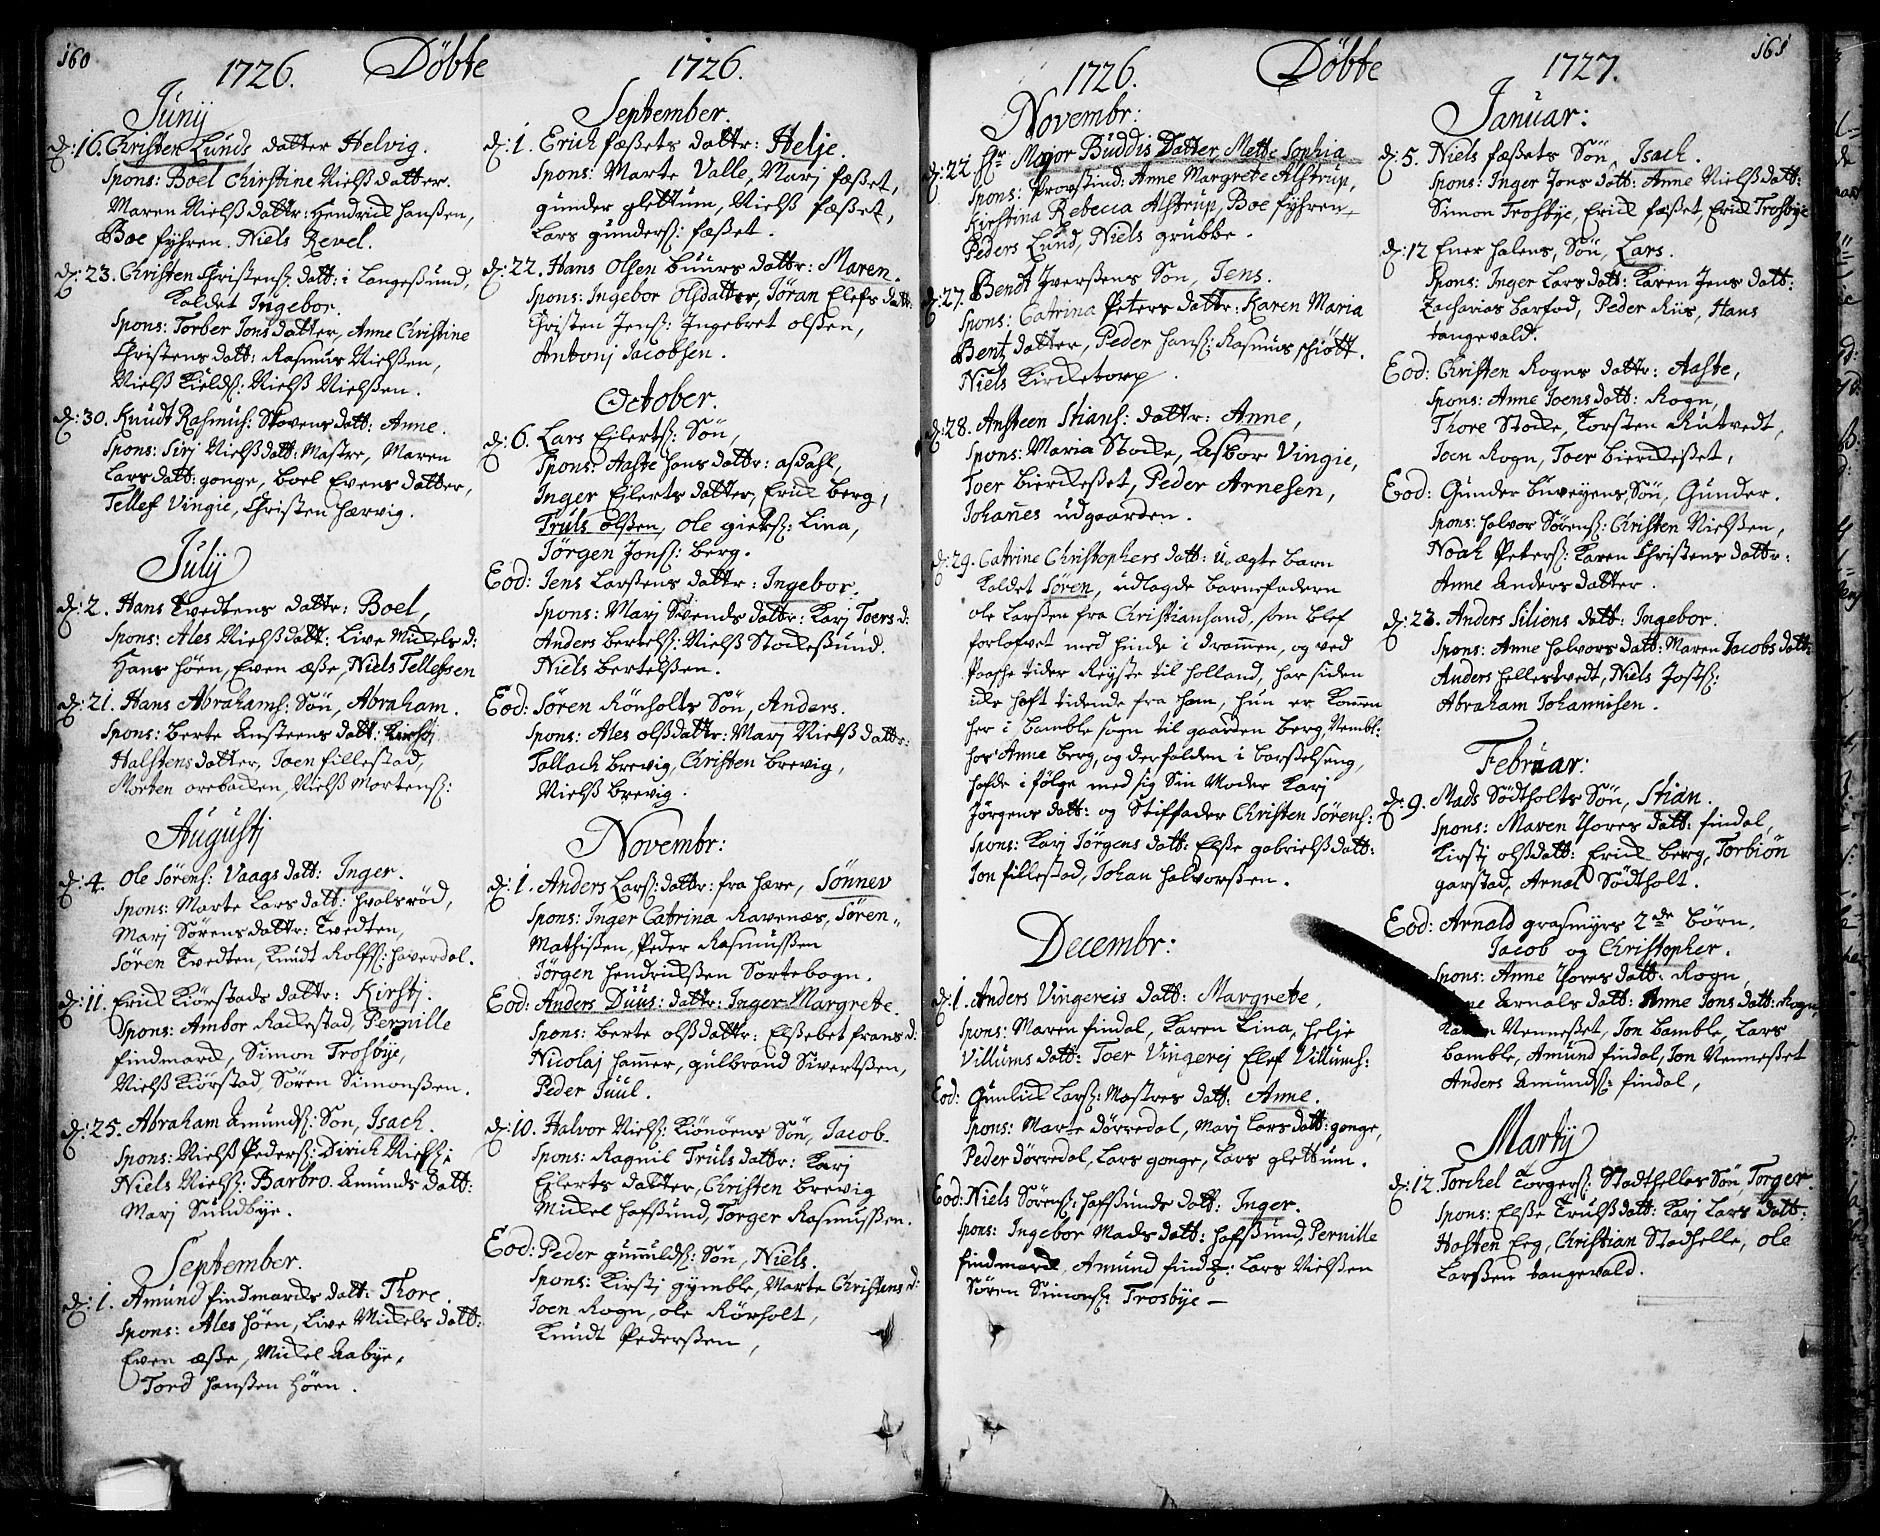 SAKO, Bamble kirkebøker, F/Fa/L0001: Ministerialbok nr. I 1, 1702-1774, s. 160-161